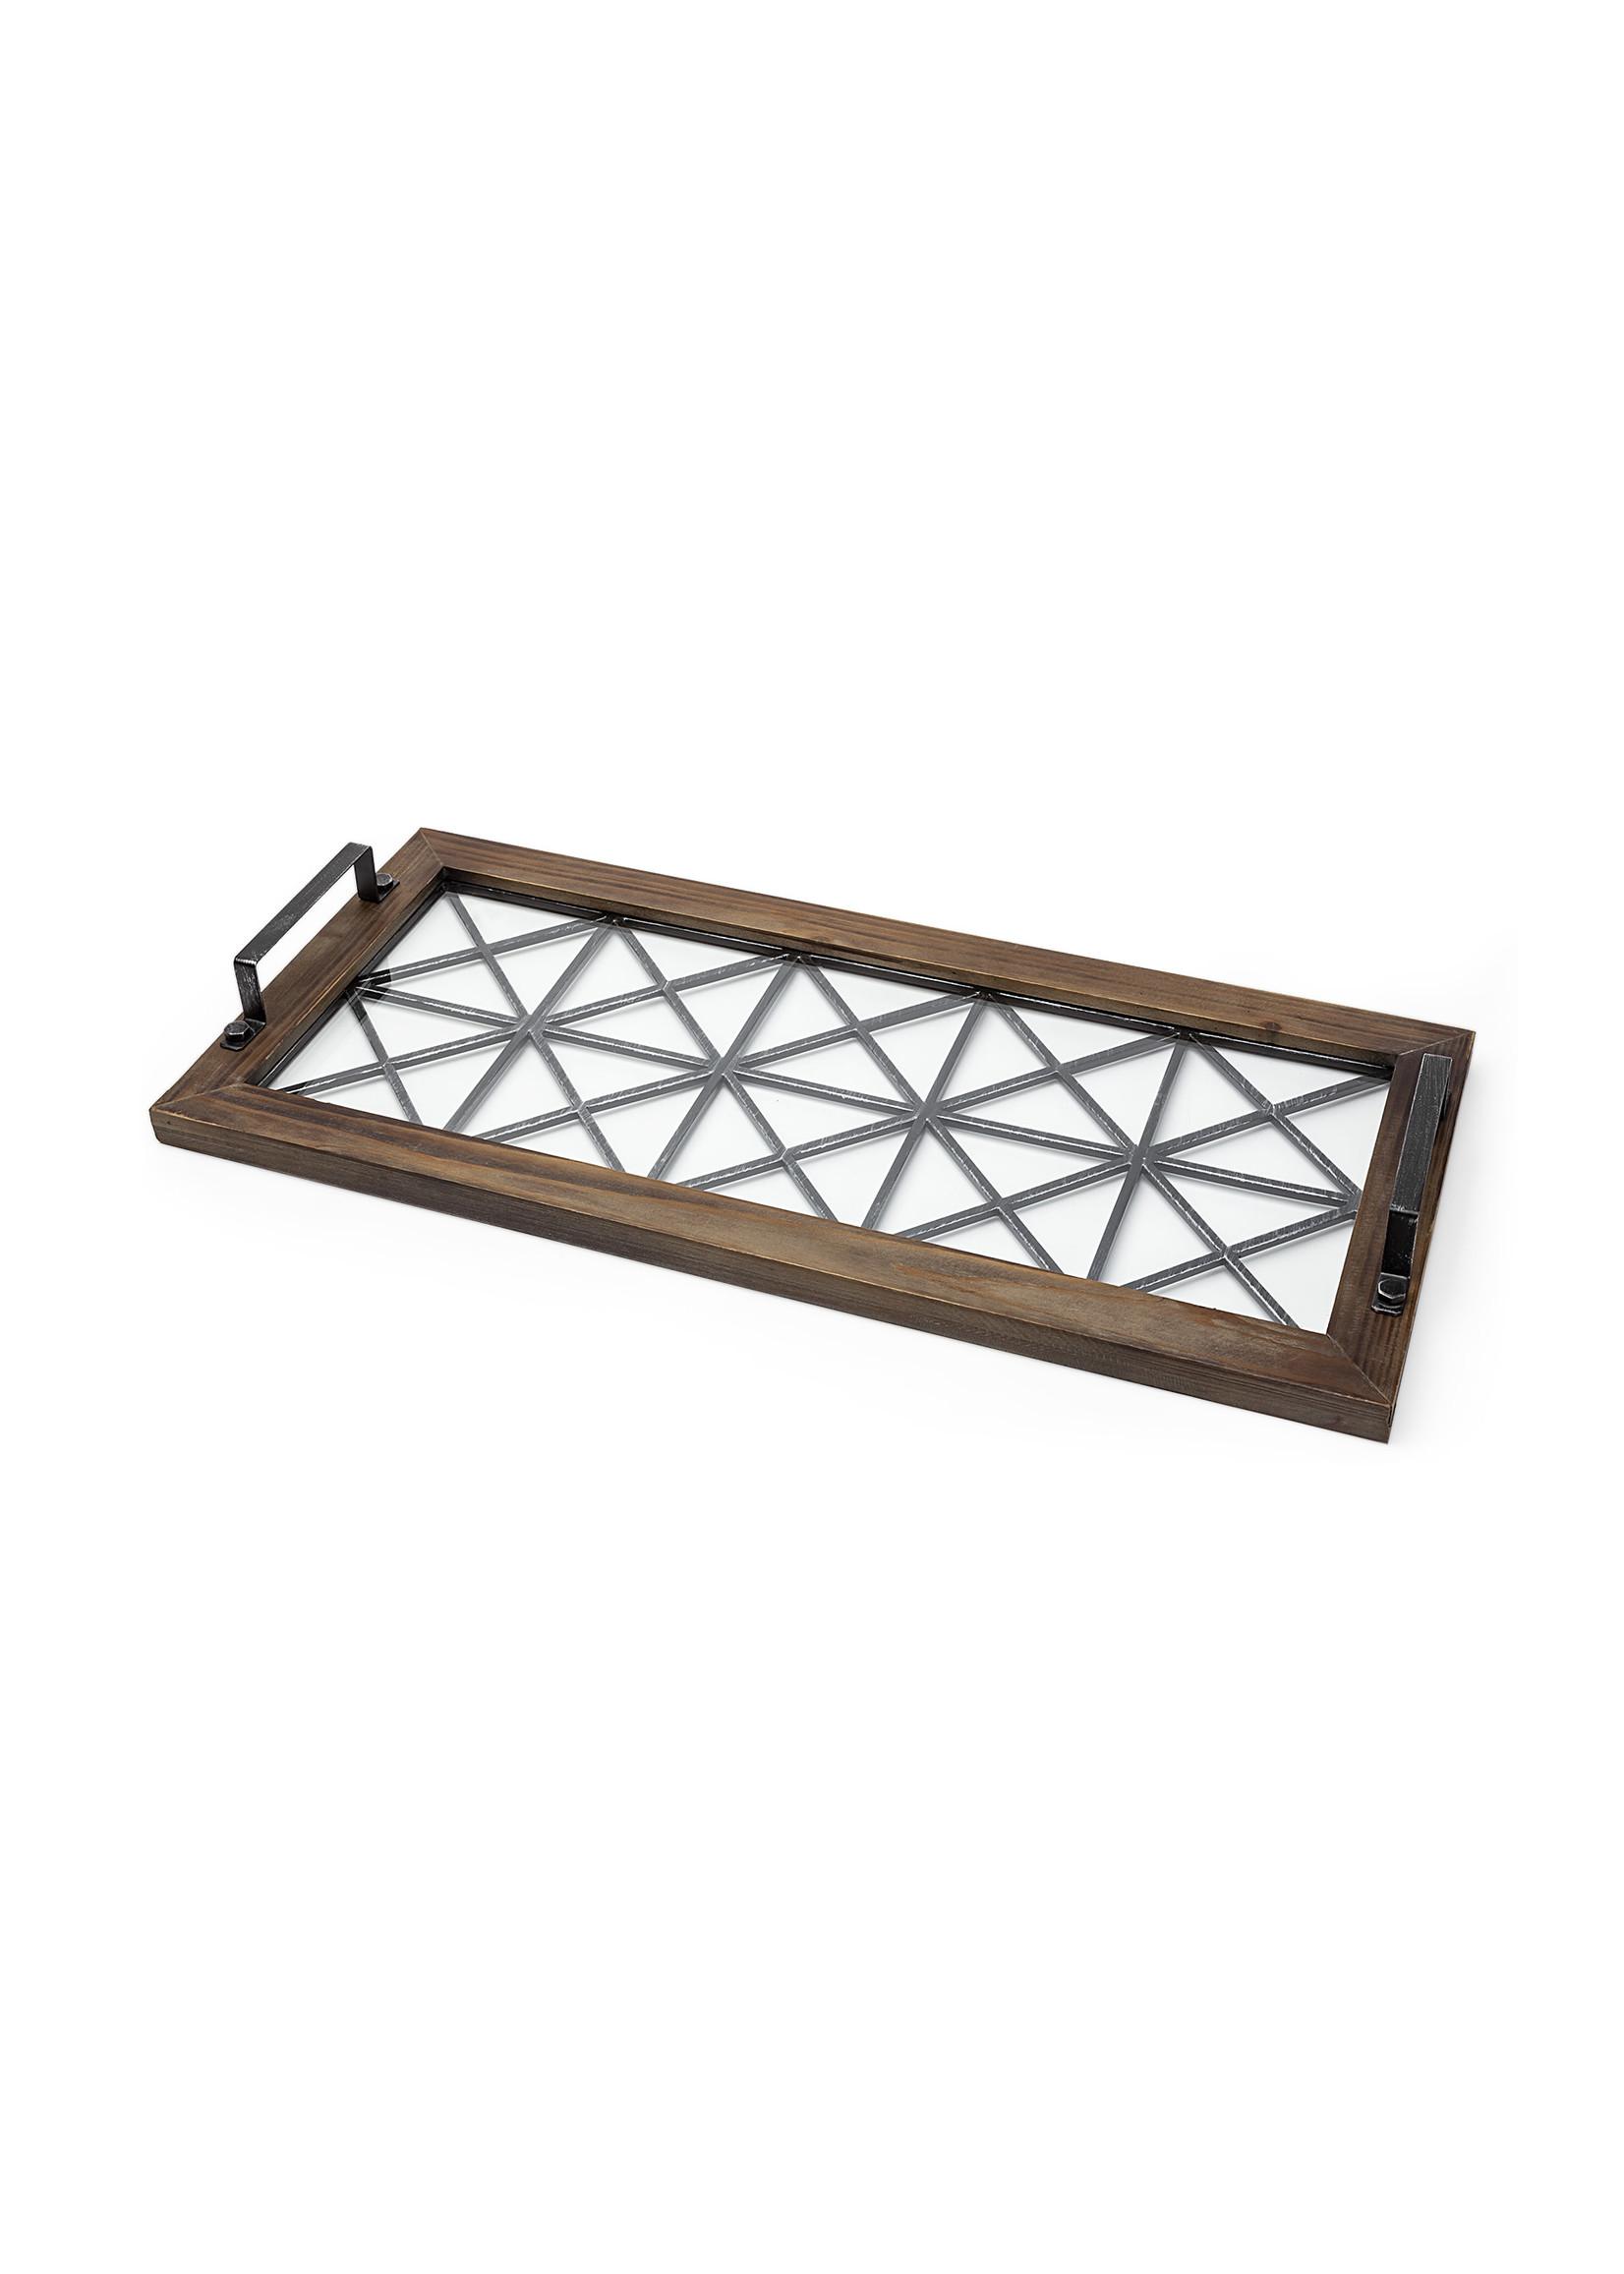 Ellingson Rectangular Tray - Small 28x13